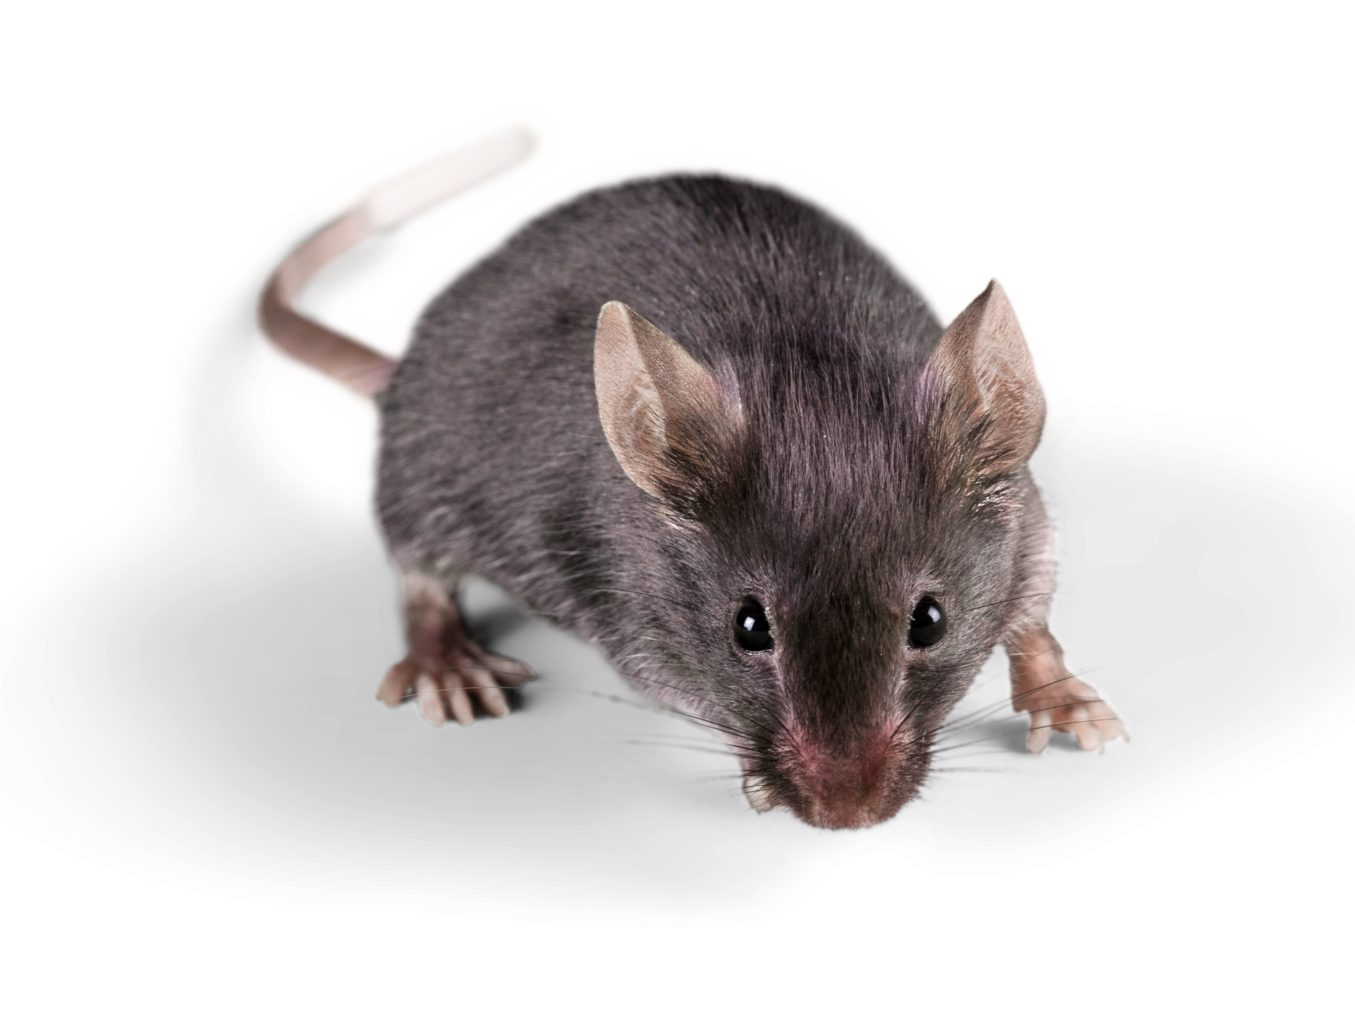 Mice, Rats and Voles